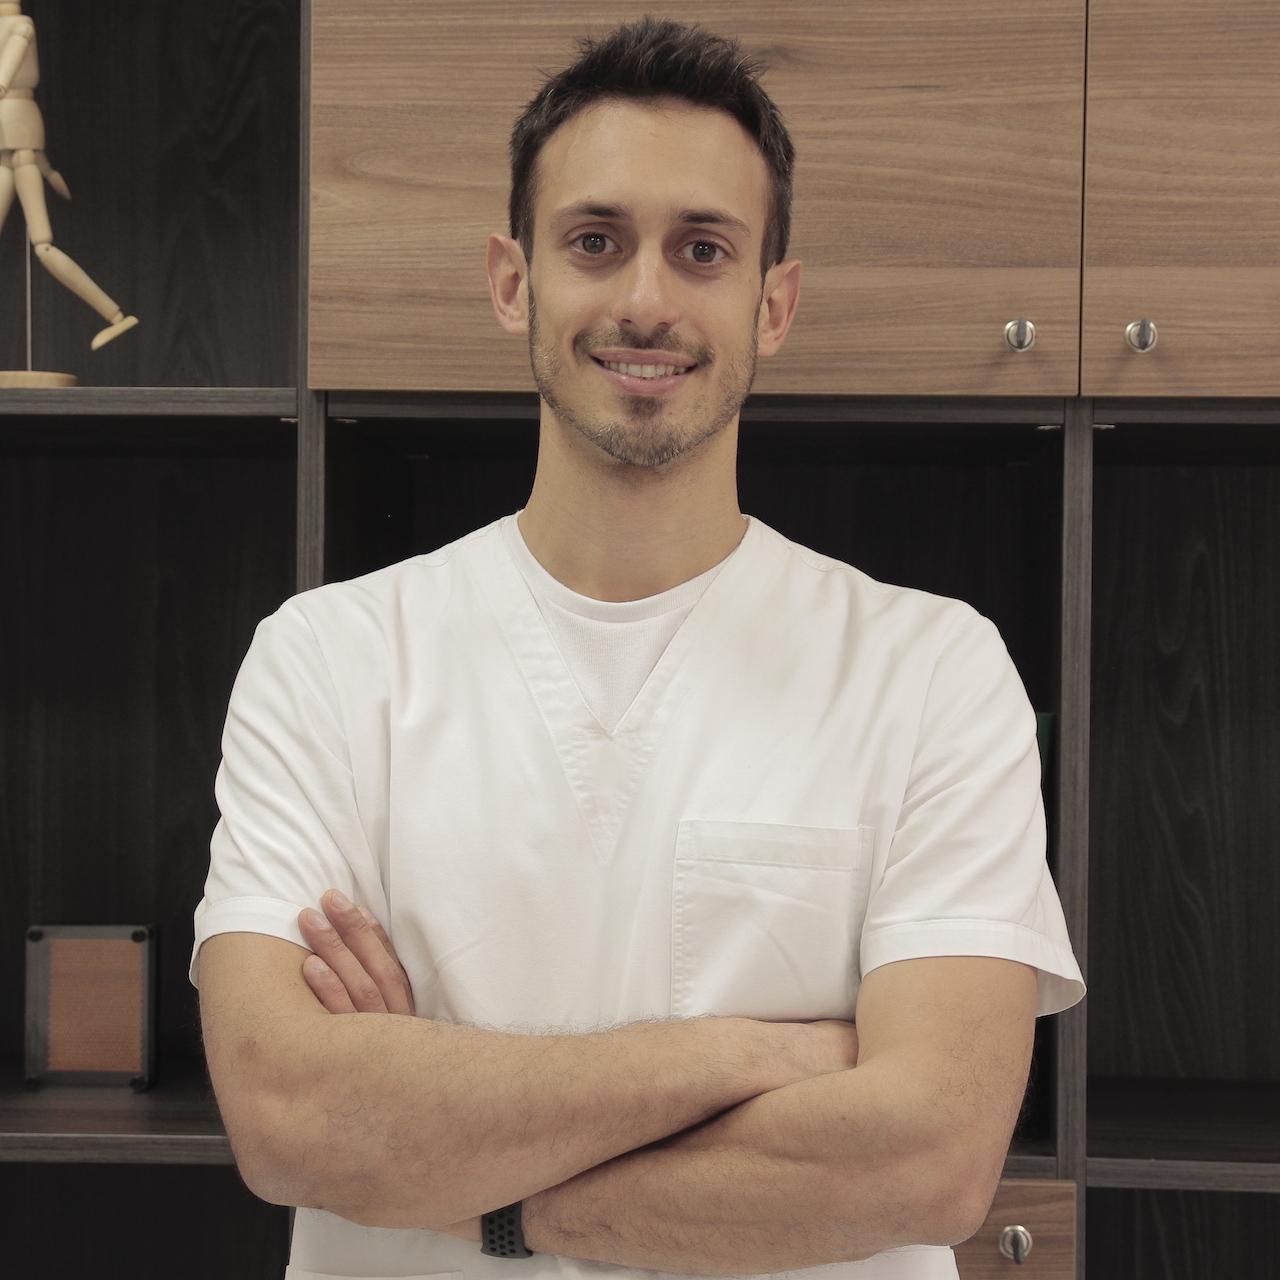 Osteopata Desenzano del Garda - Tommaso Bianchi